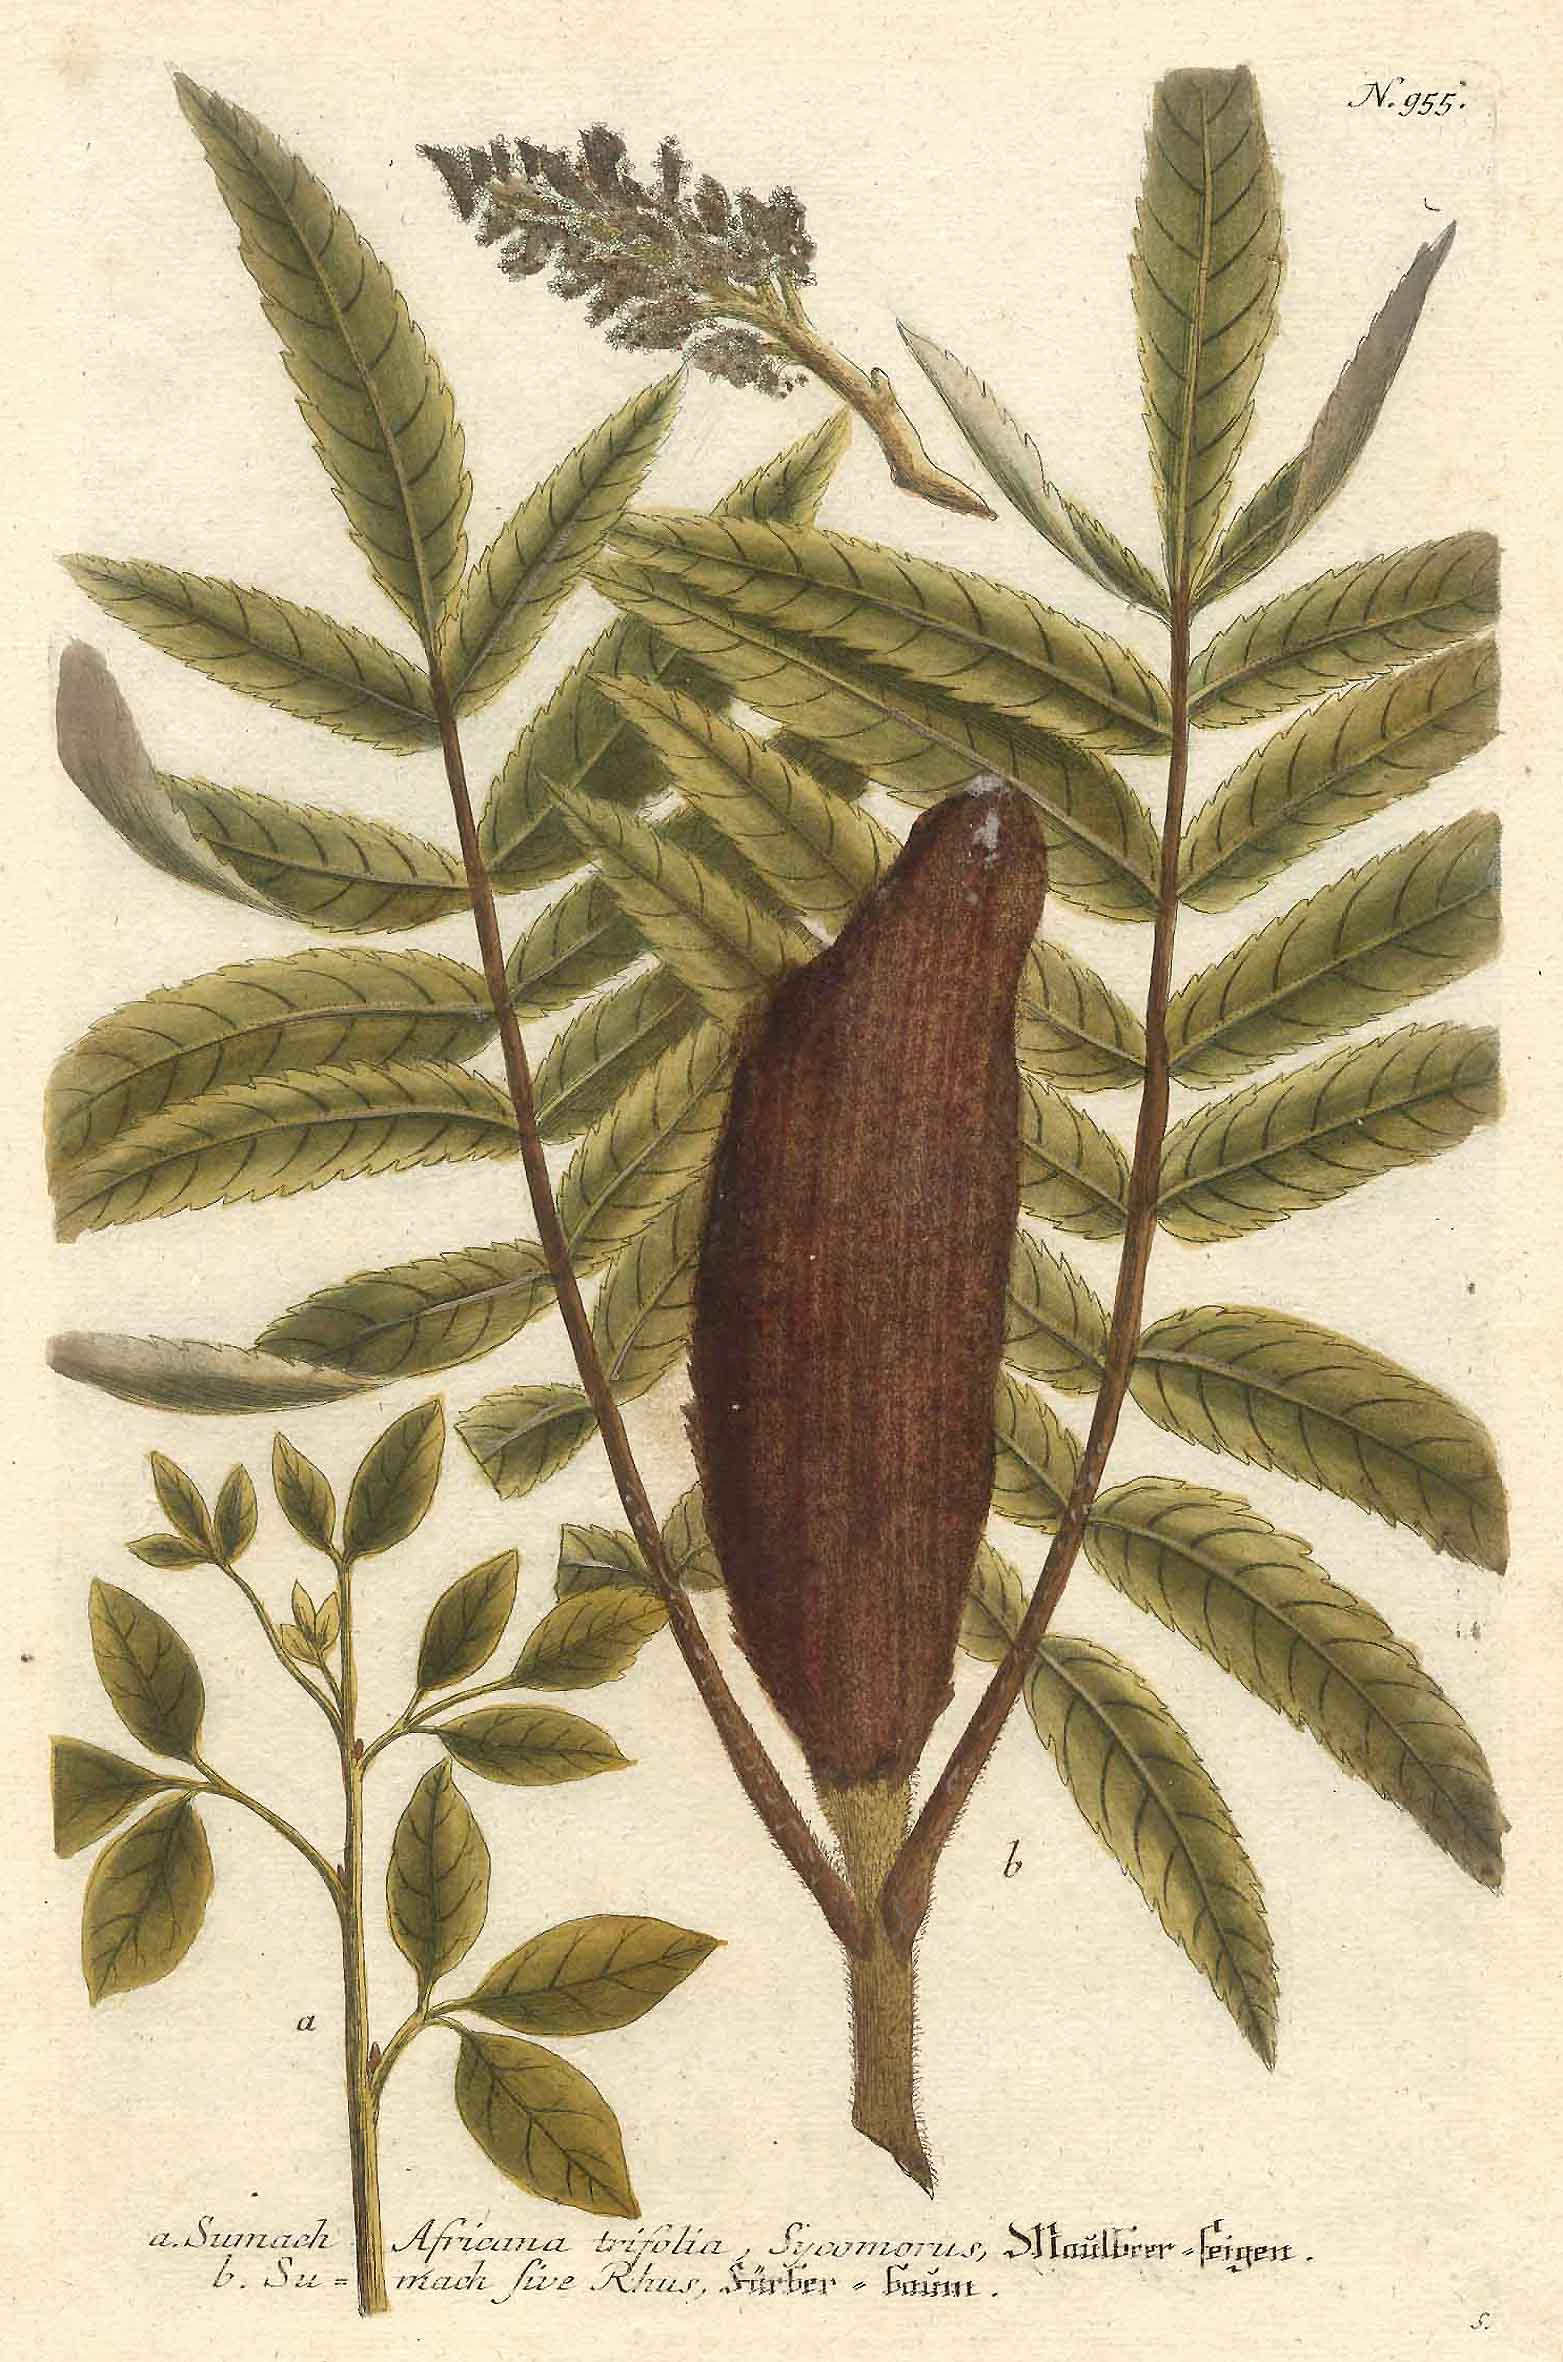 a) Sumach Africana trifolia, Sycomorus, Maulbeerbaum. -: HEILKRÄUTER: MAULBEERFEIGEN -